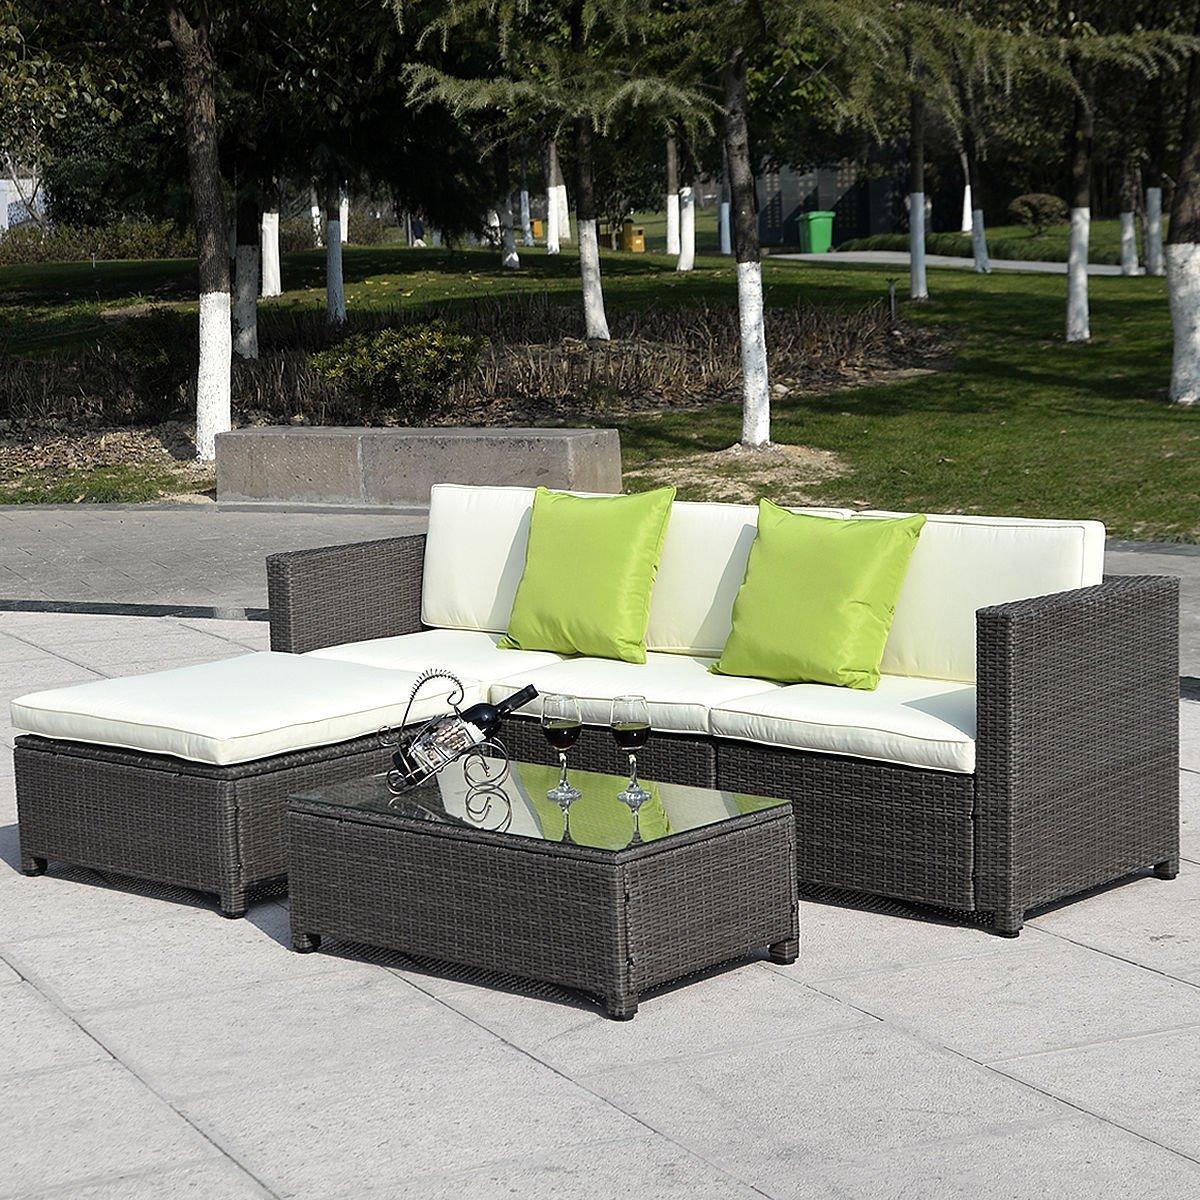 Amazoncom Goplus5PC Outdoor Patio Sofa Set Furniture PE Wicker